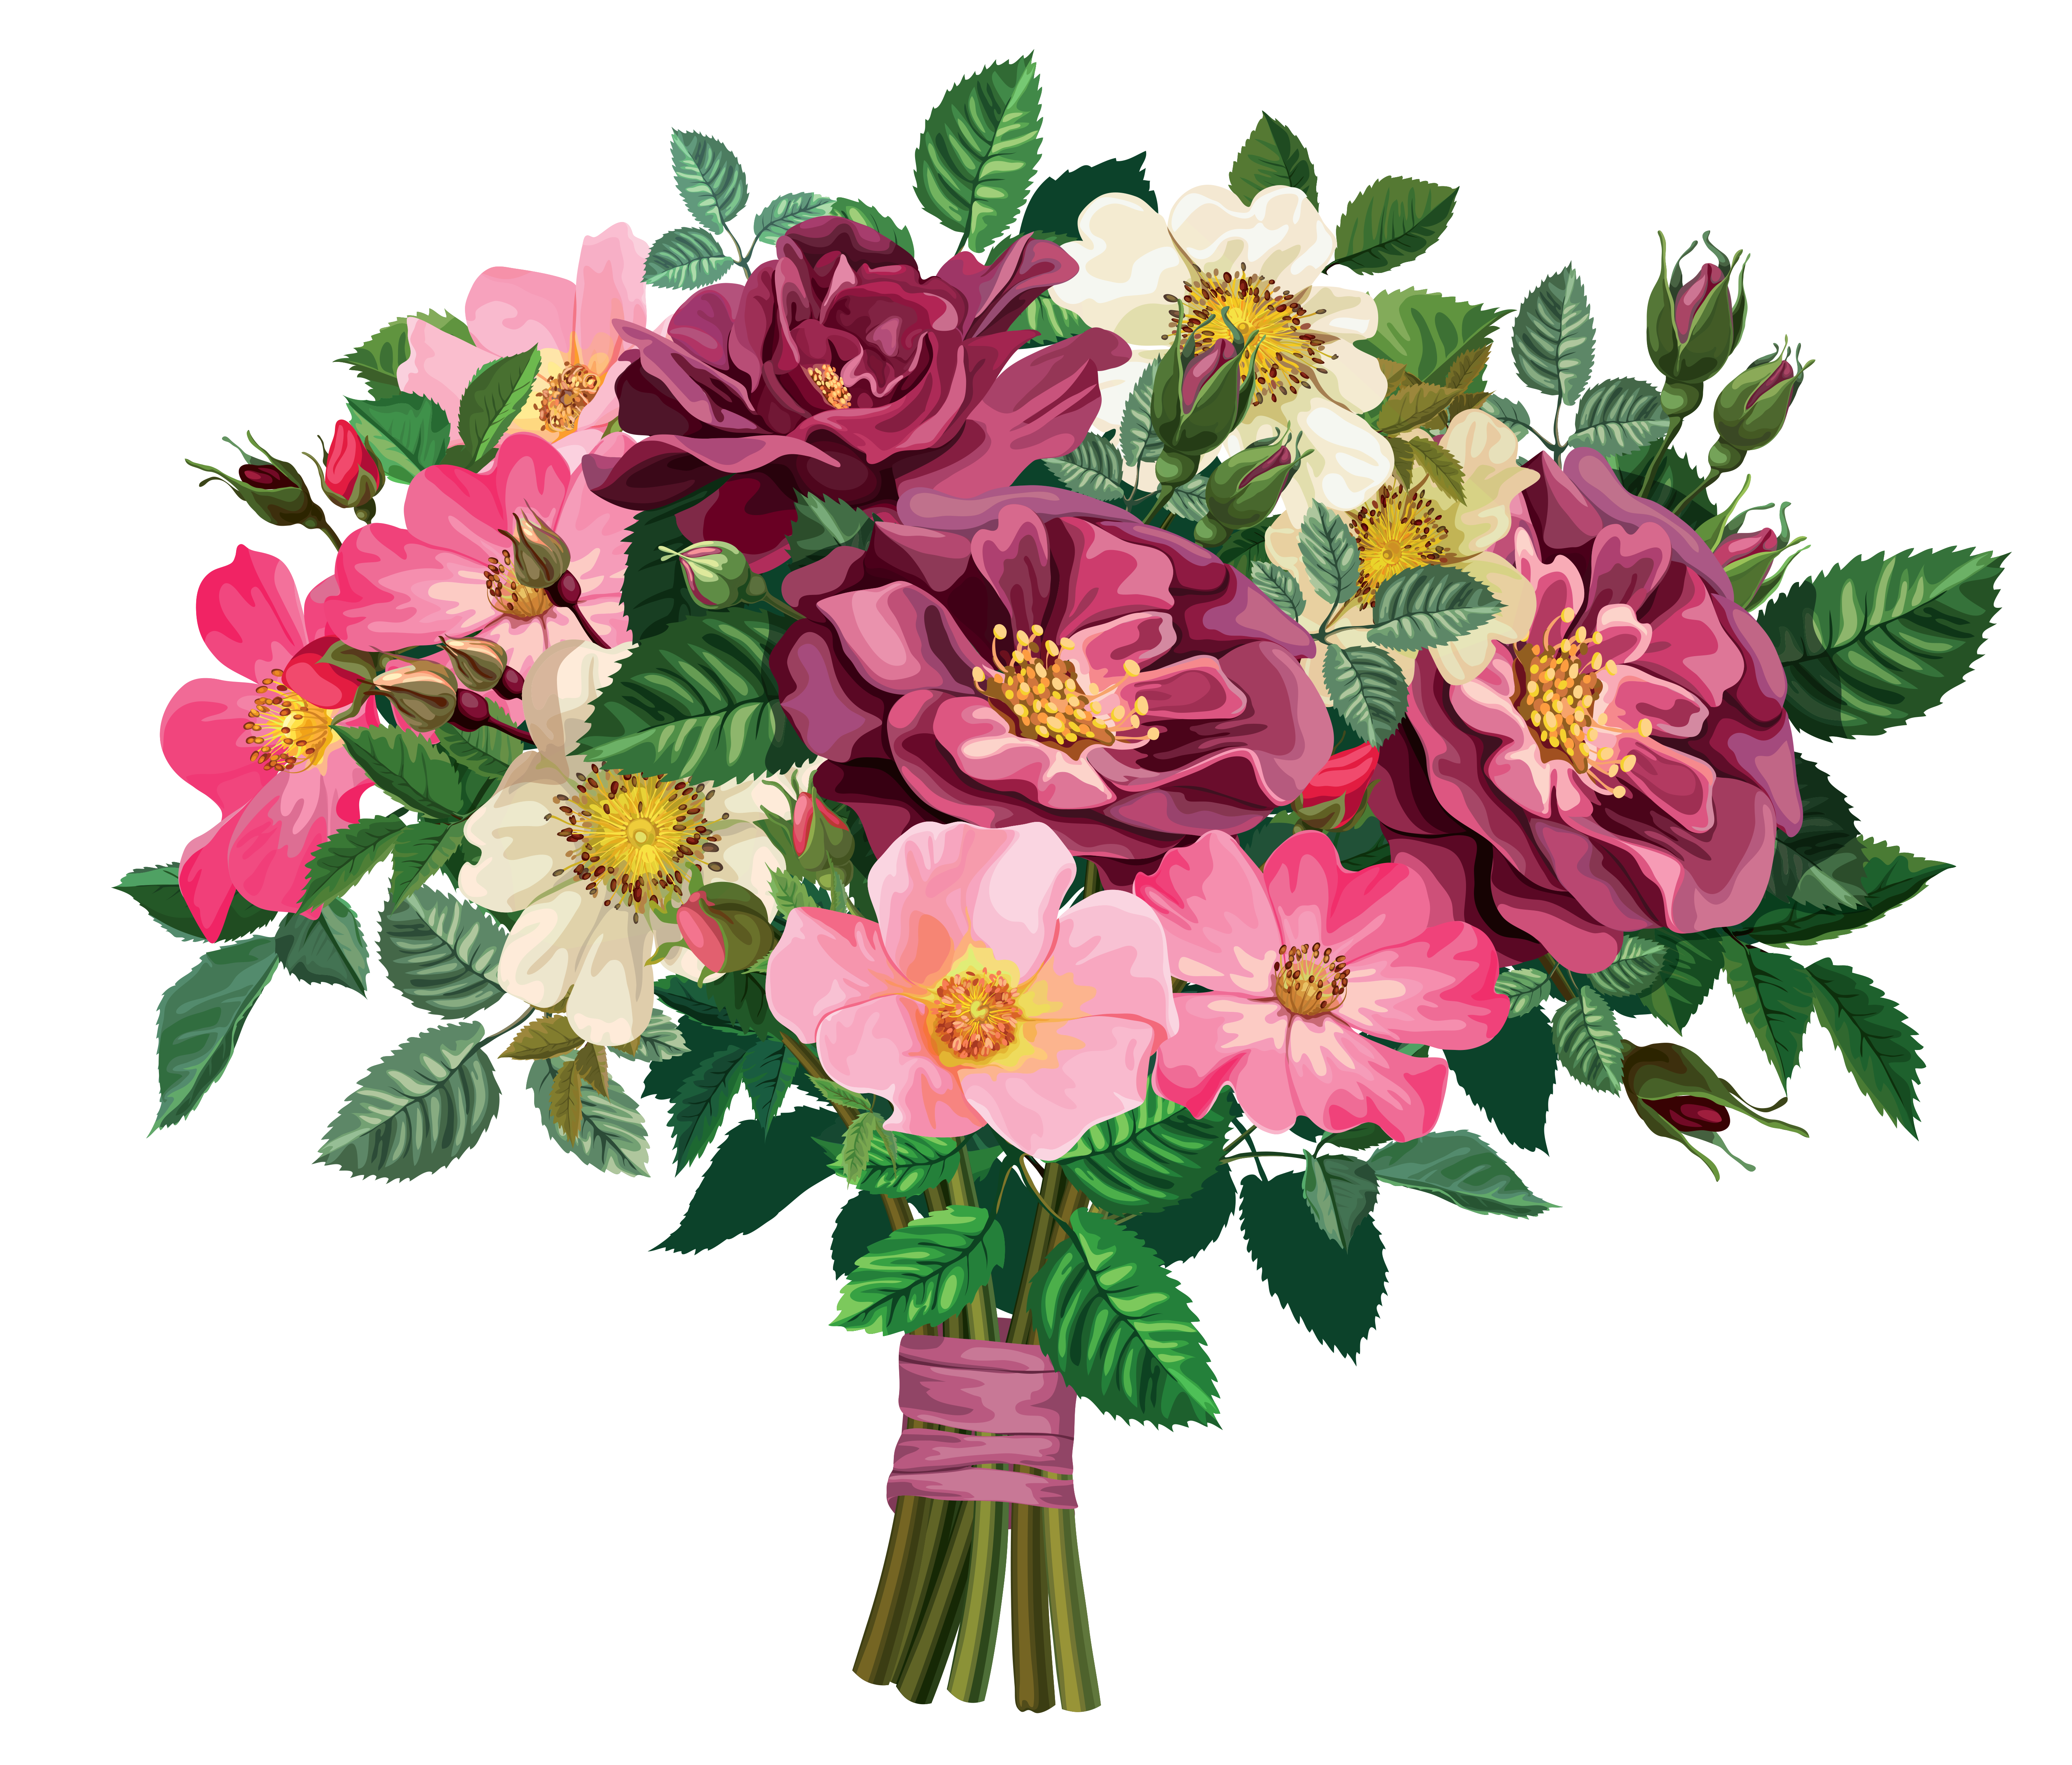 Flower Bouquet Clipart - .-Flower Bouquet Clipart - .-11